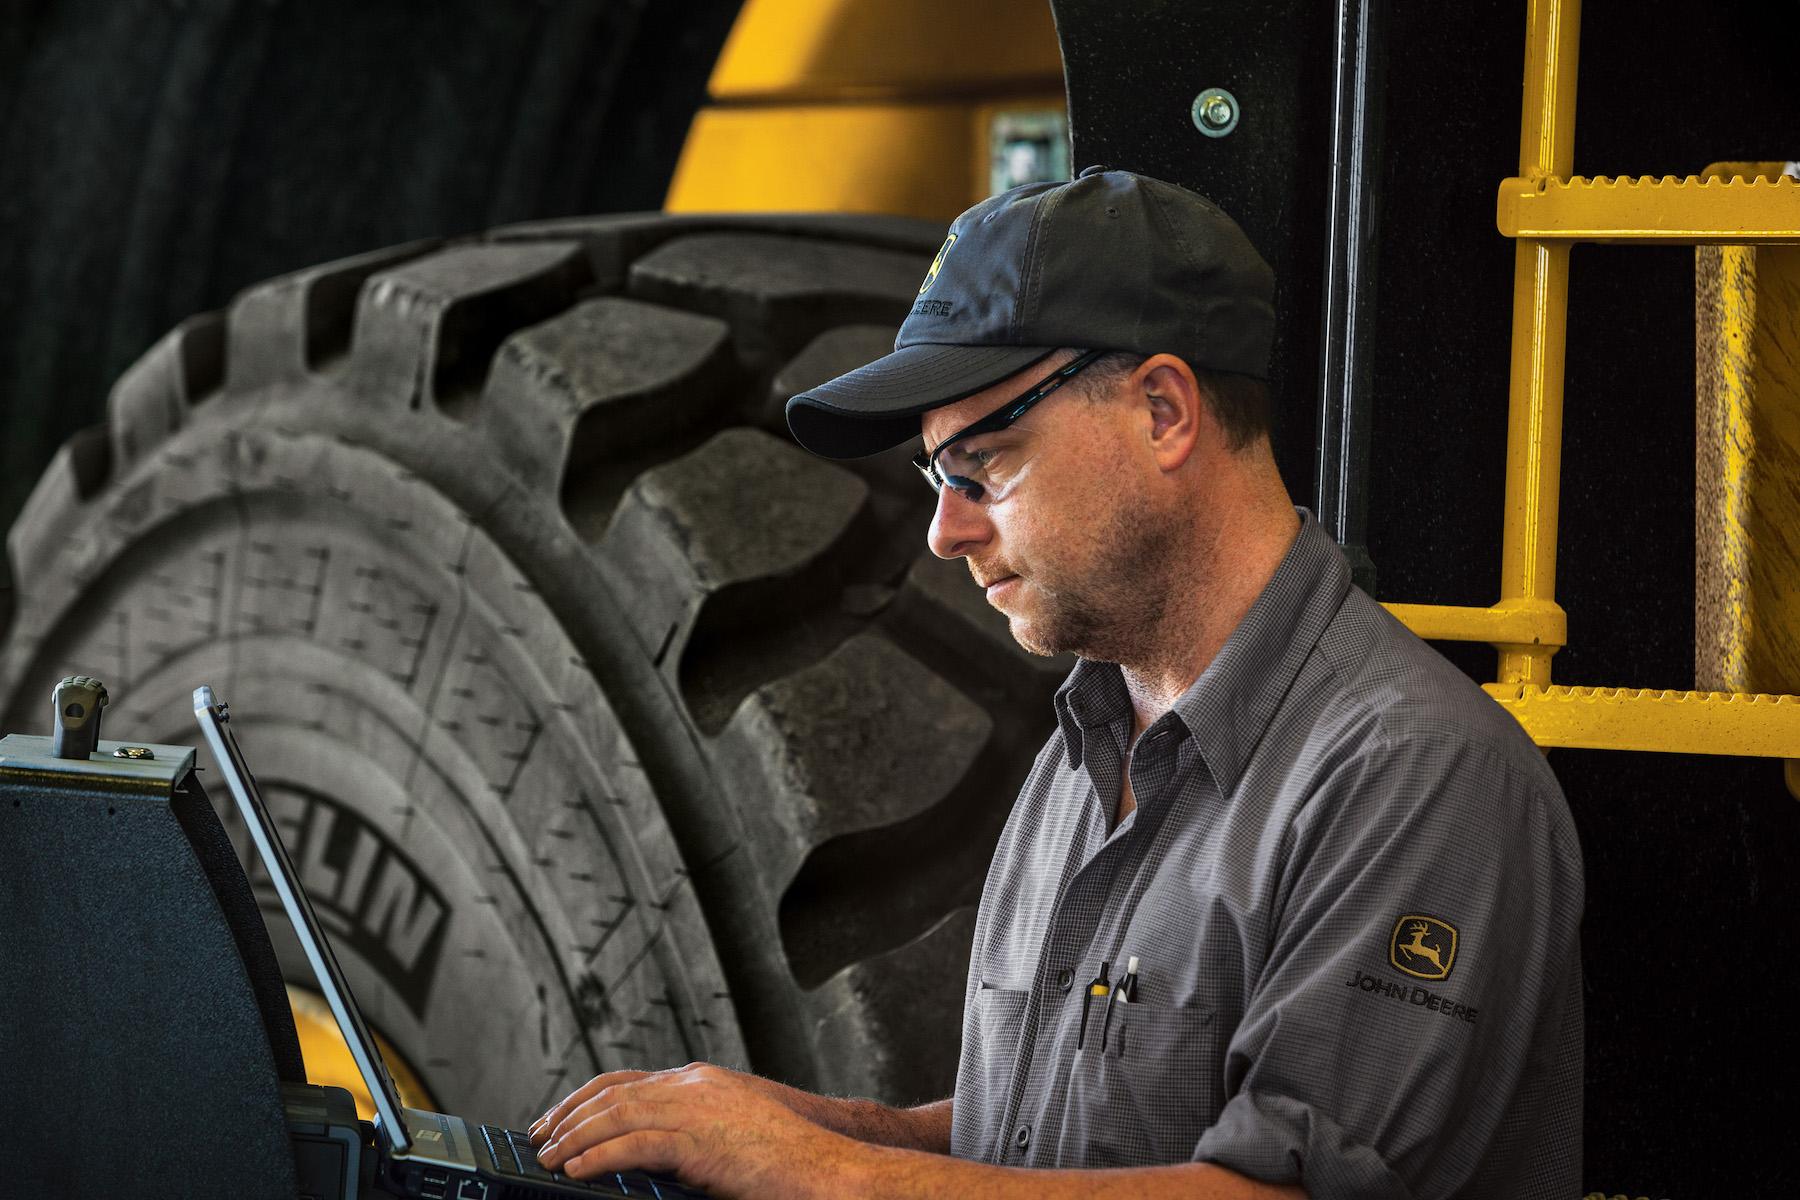 John Deere has received approval for its new Registered Apprenticeship Program.